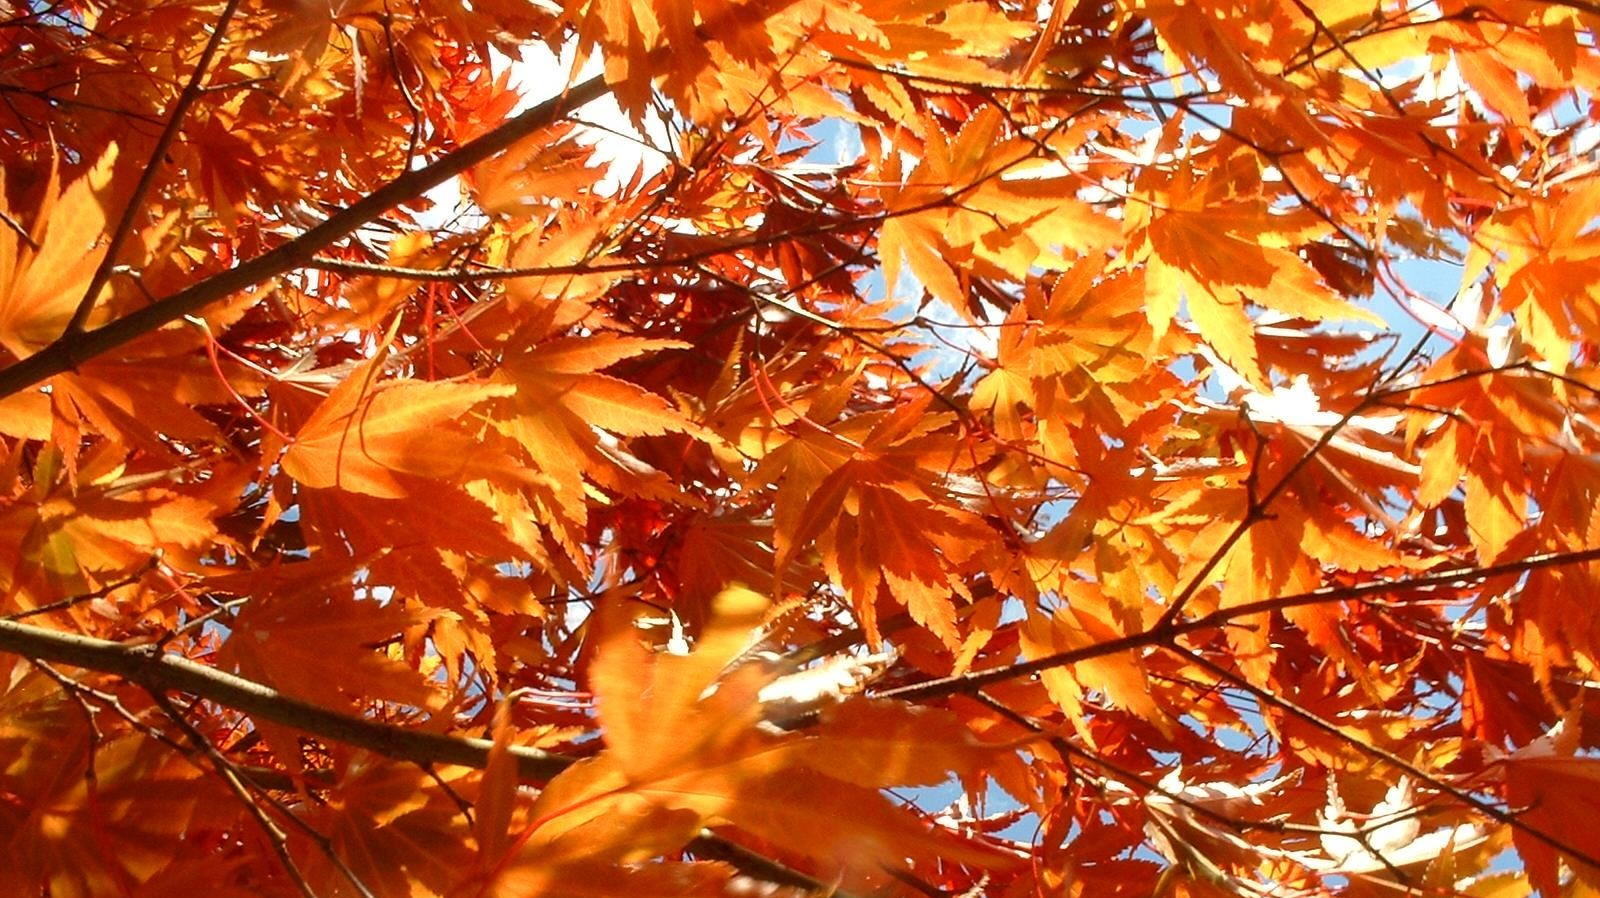 hotel zero degrees, blog, events, fall foliage, connecticut